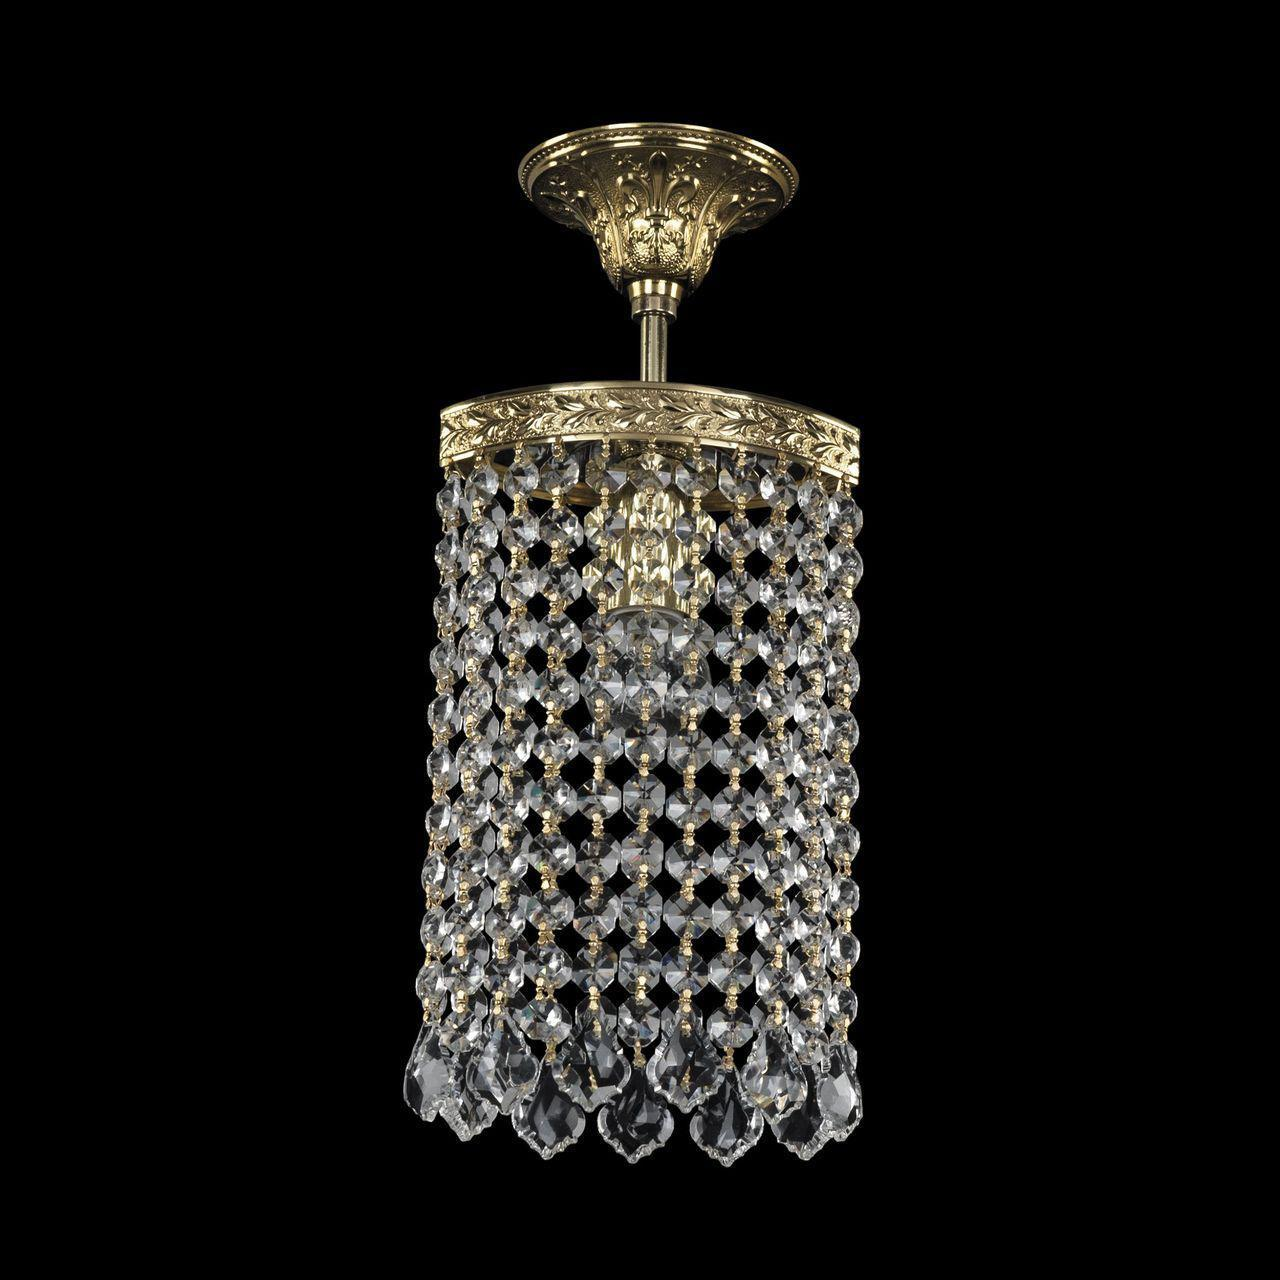 Подвесной светильник Bohemia Ivele 19203/15IV G Leafs